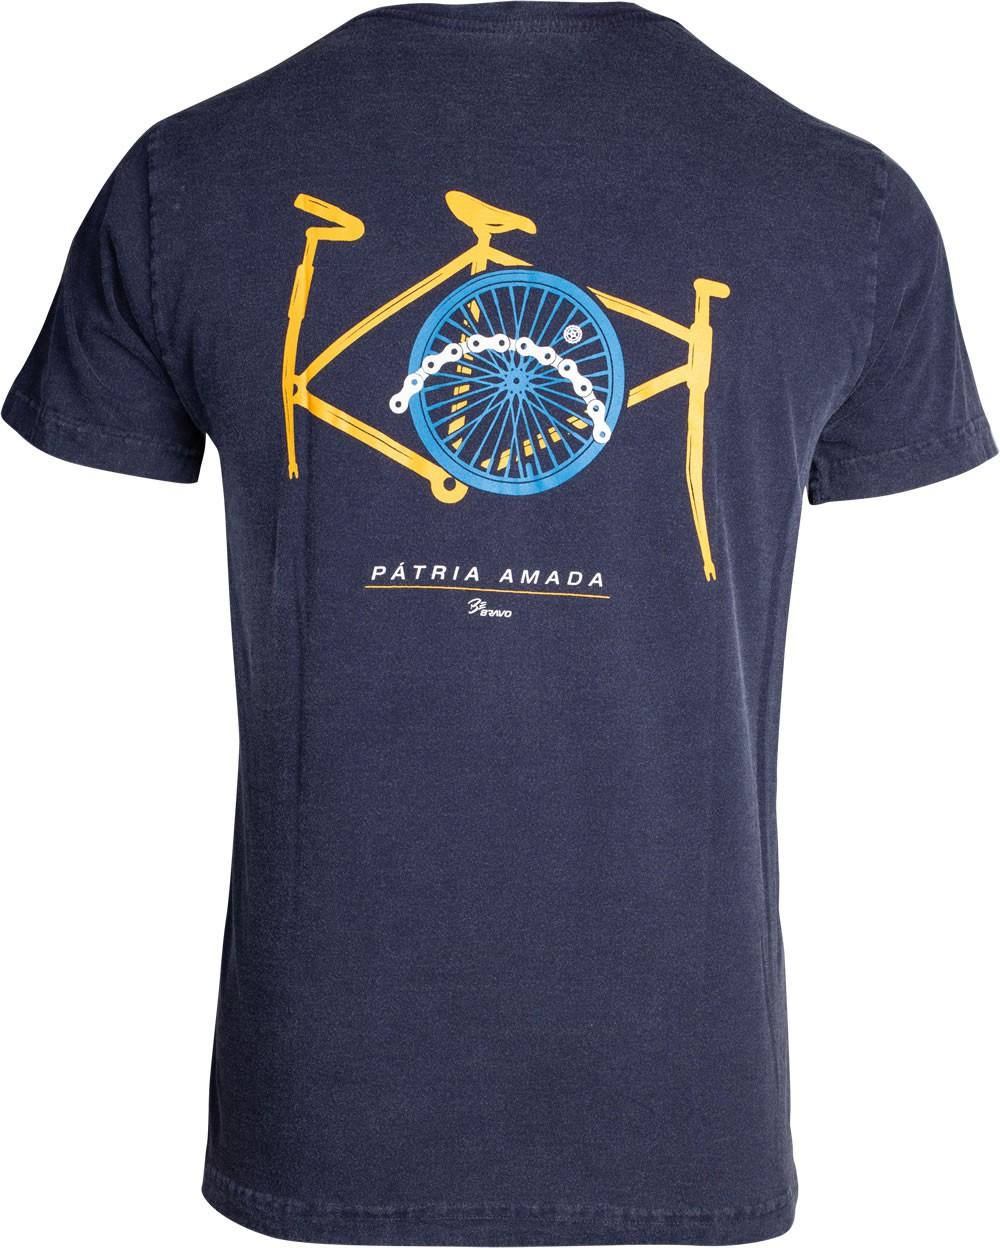 Camiseta Be Bravo Pátria Amada Masculino Azul